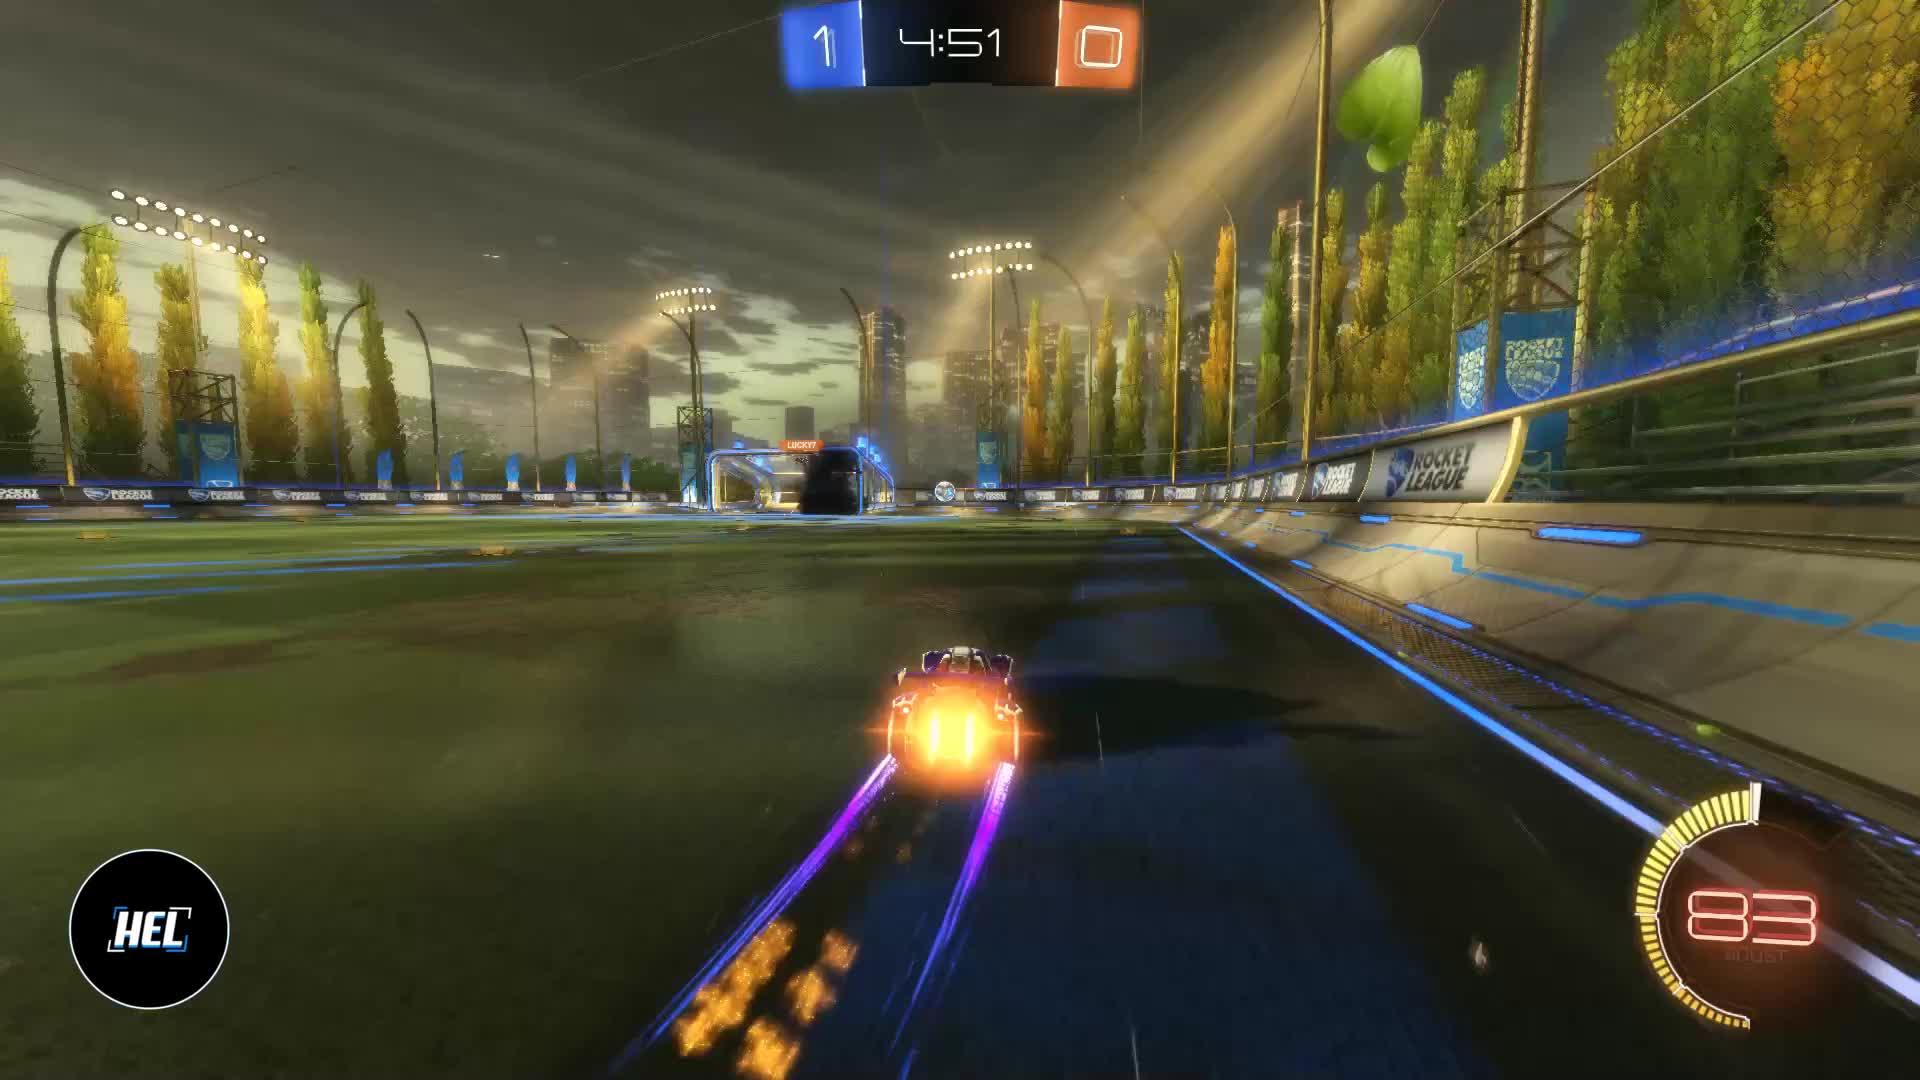 Gif Your Game, GifYourGame, Goal, Hel, Rocket League, RocketLeague, Goal 2: Hel GIFs